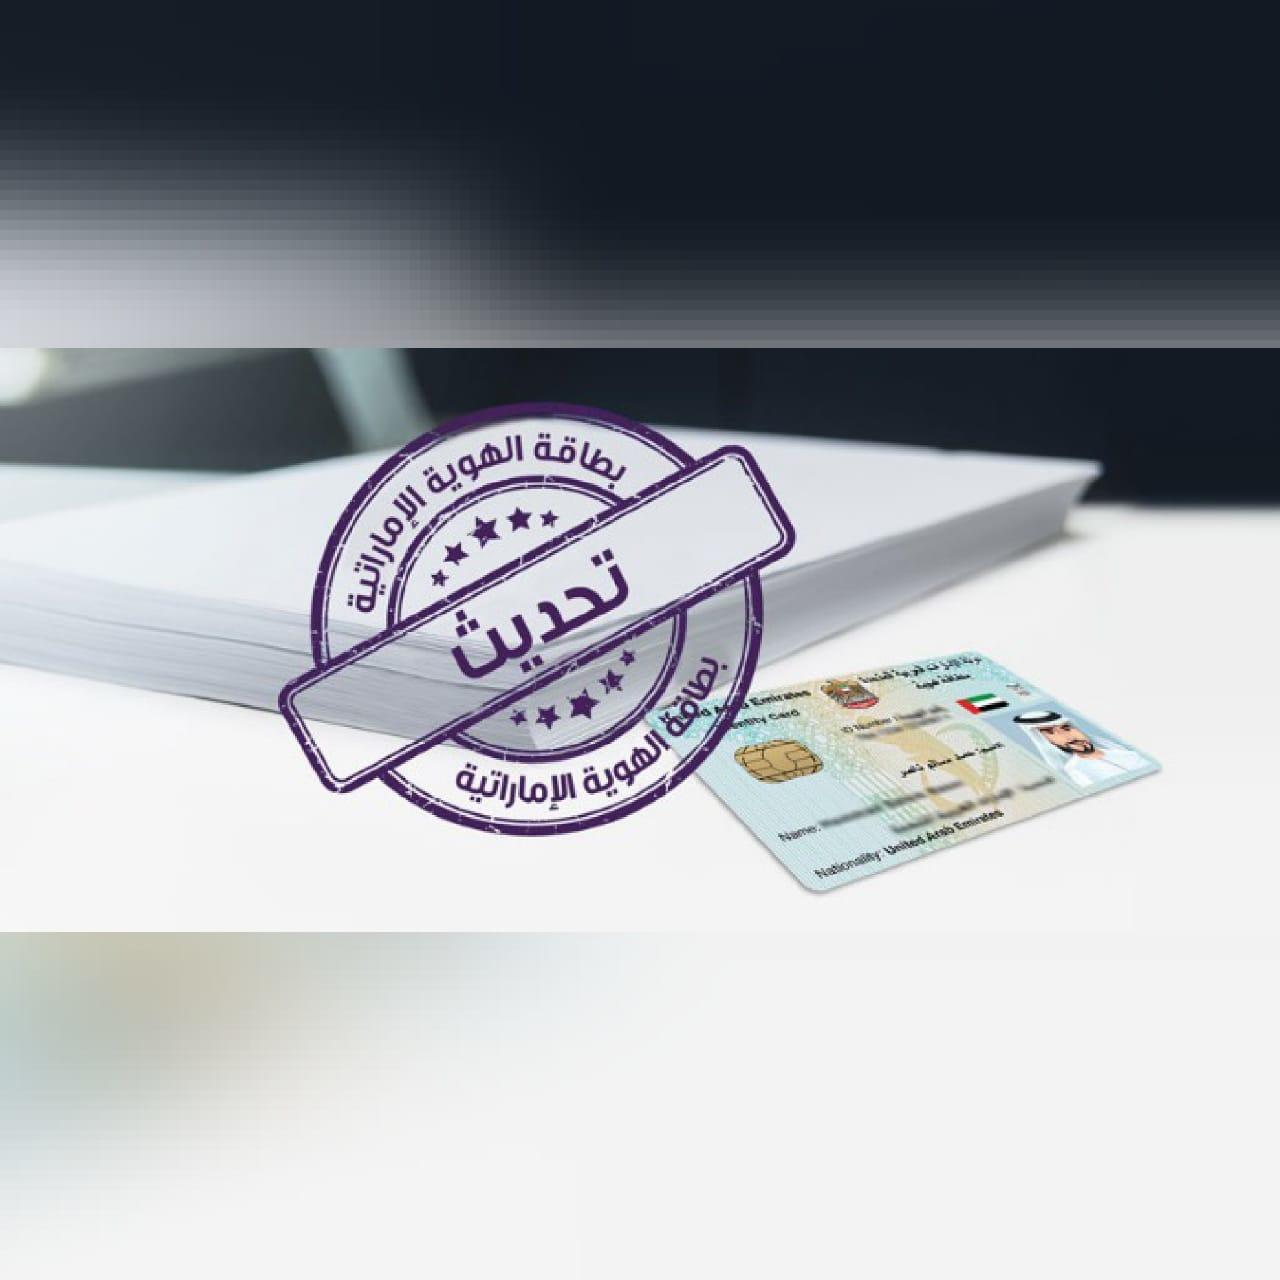 ابوحامد للخدمات بالامارات واصدار هويه